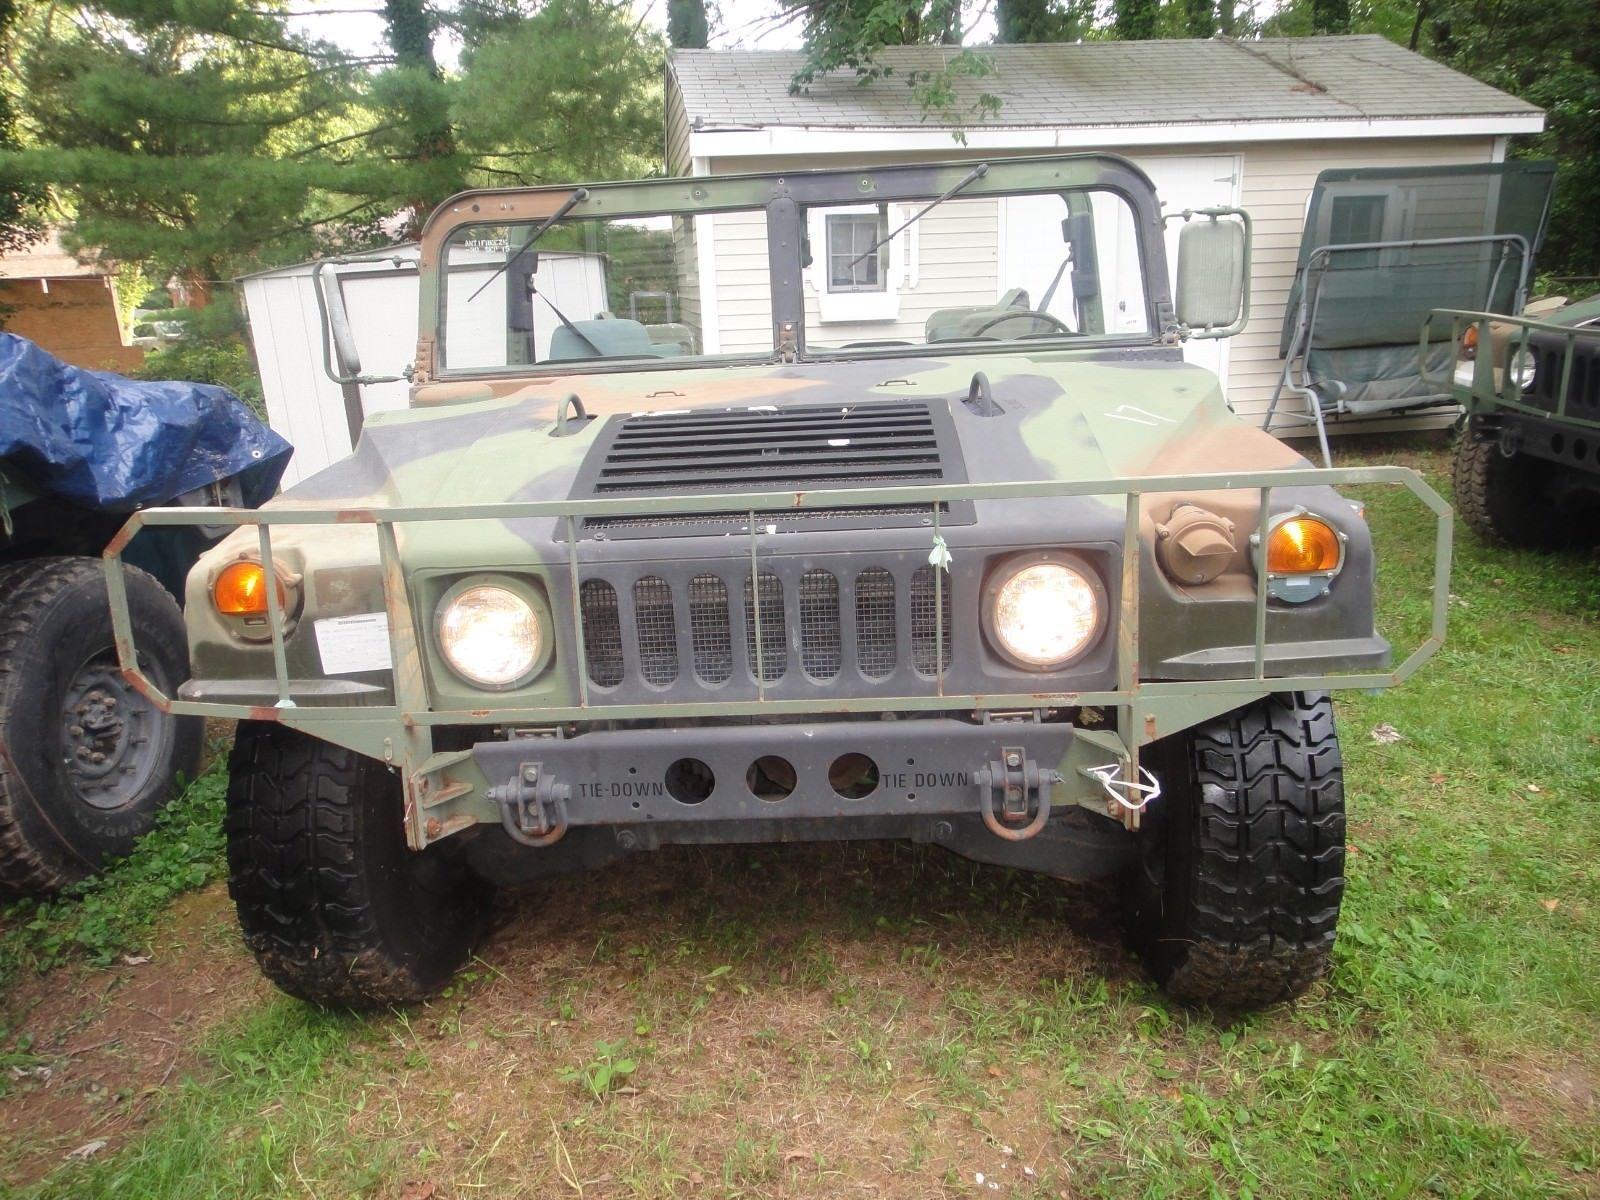 cool Amazing 1993 Hummer H1 1993 Hummer H1 Humvee 2017 2018 Check